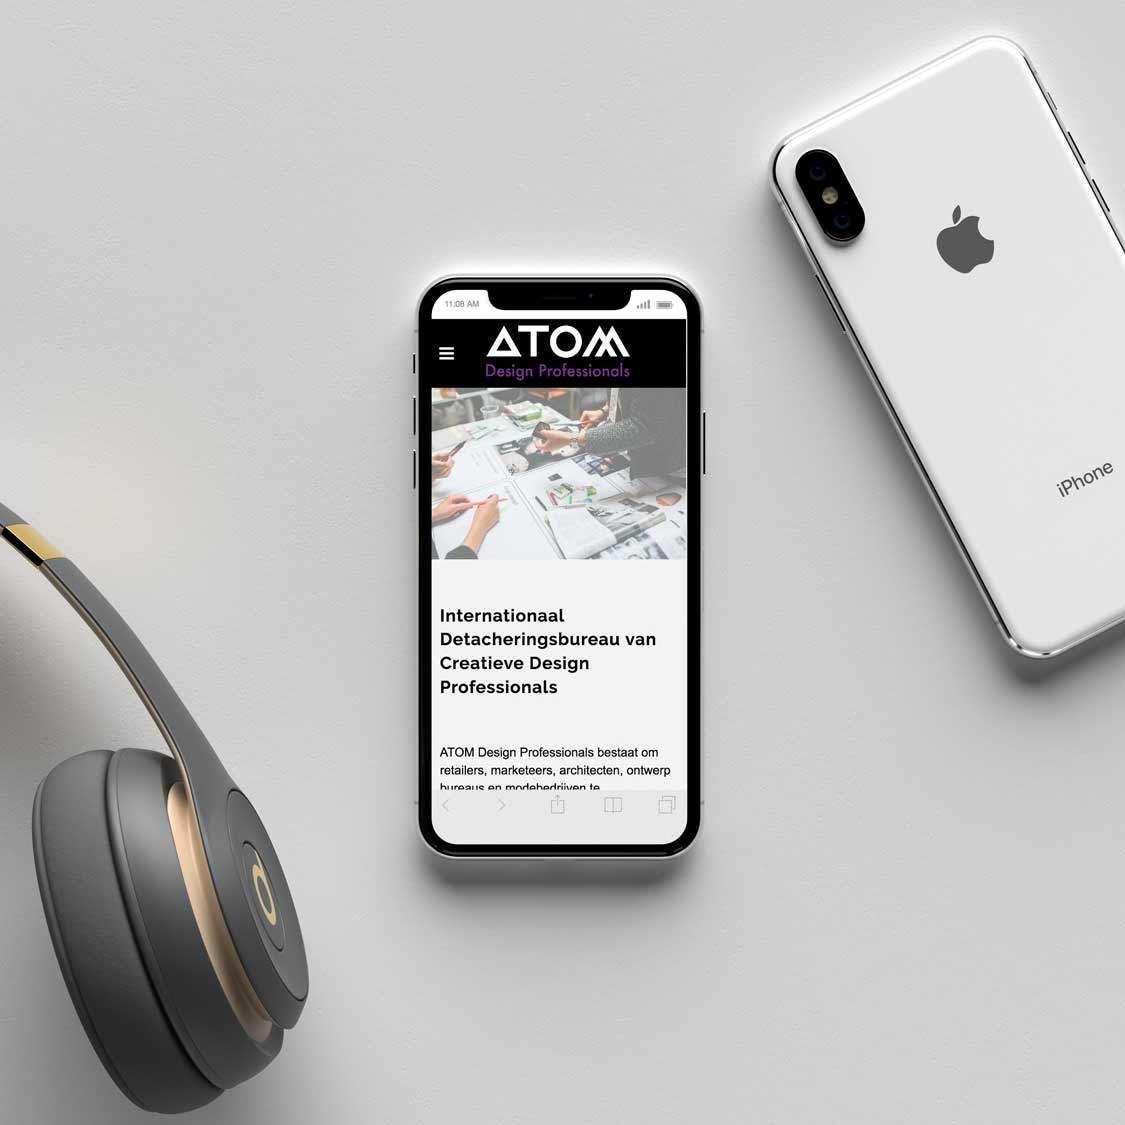 atom-design-professionals-online-marketing-bureau-webdevelopment-haarlem-made-marketing-3